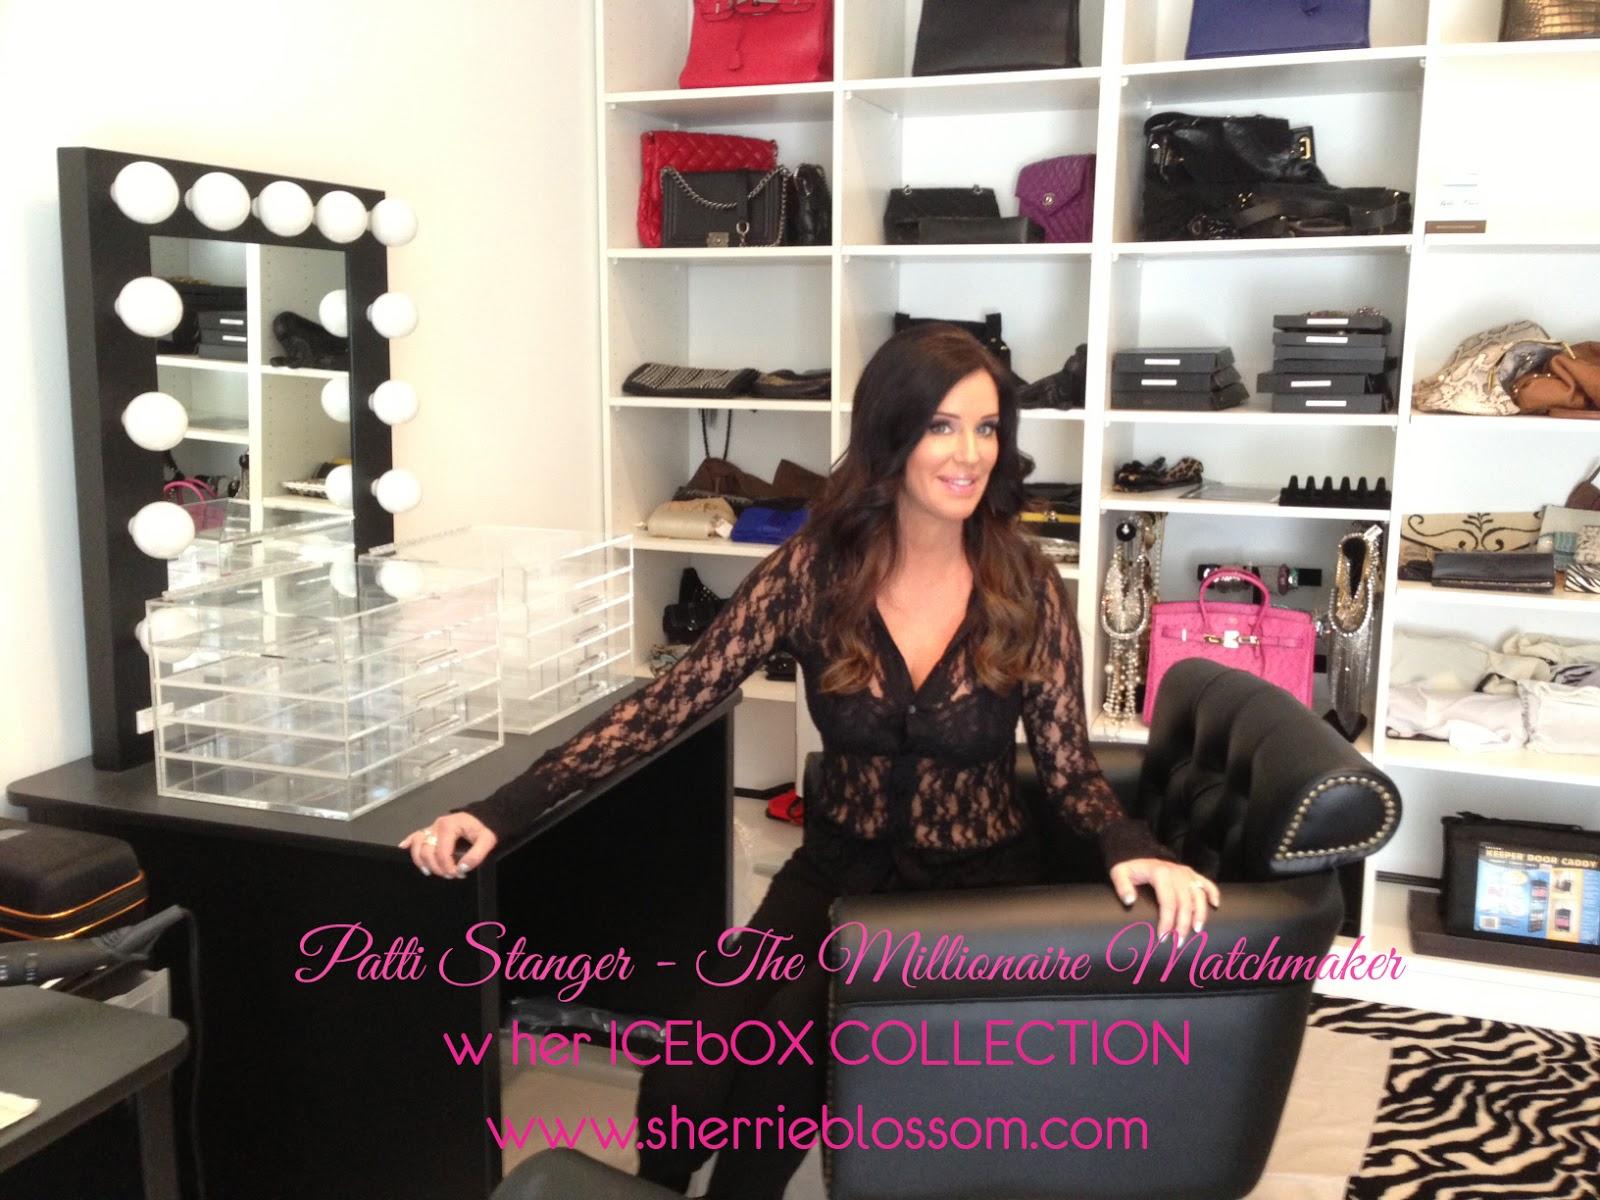 Icebox By Sherrieblossom Voted Best Design Kardashian